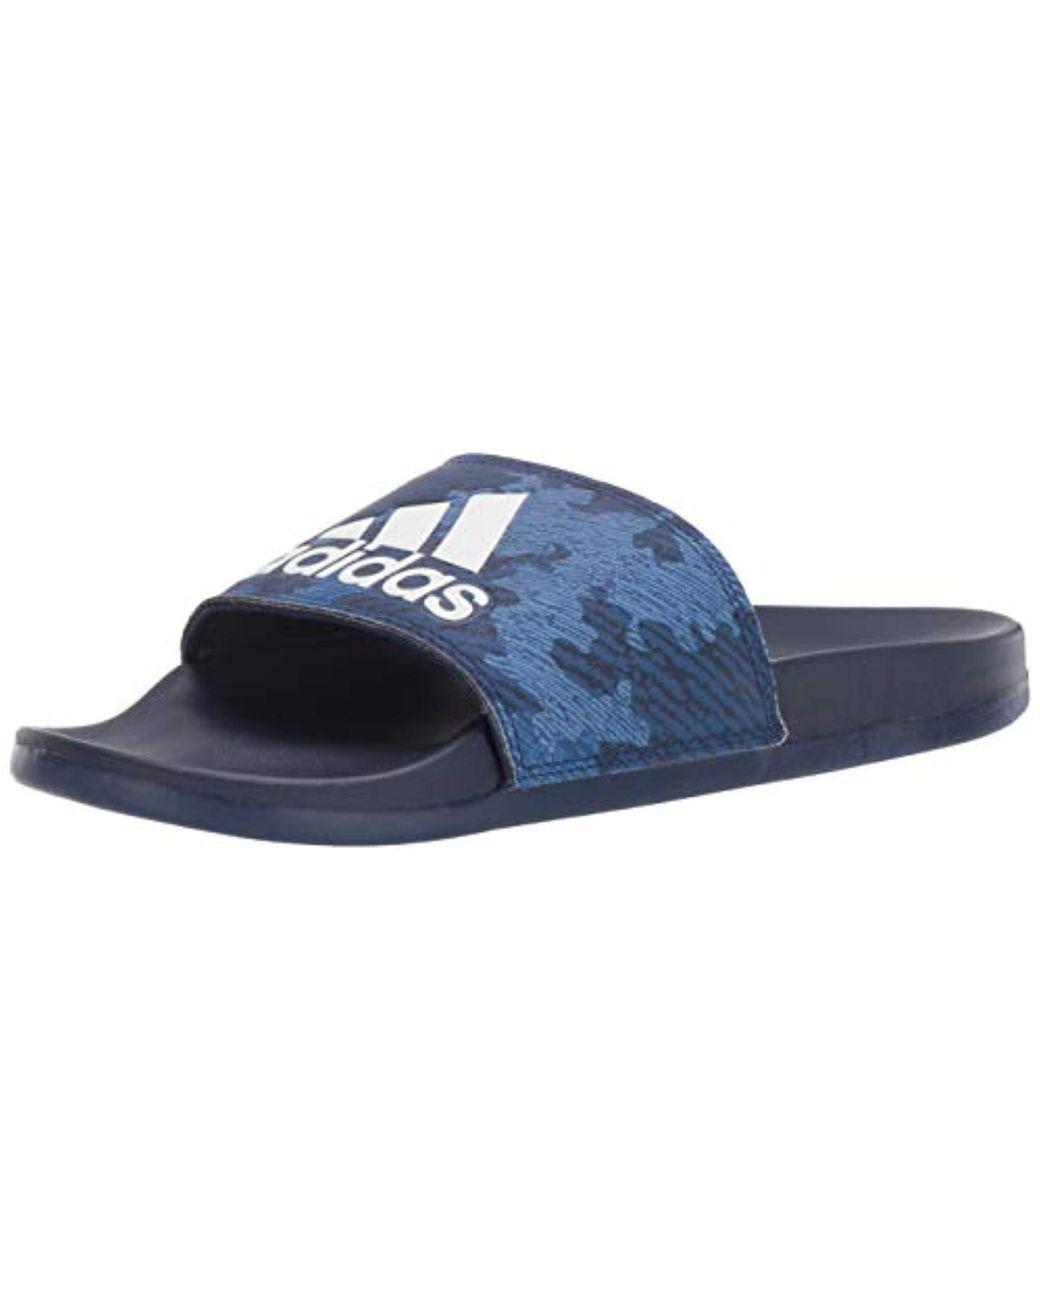 1e8d8aa9f Lyst - adidas Adilette Comfort